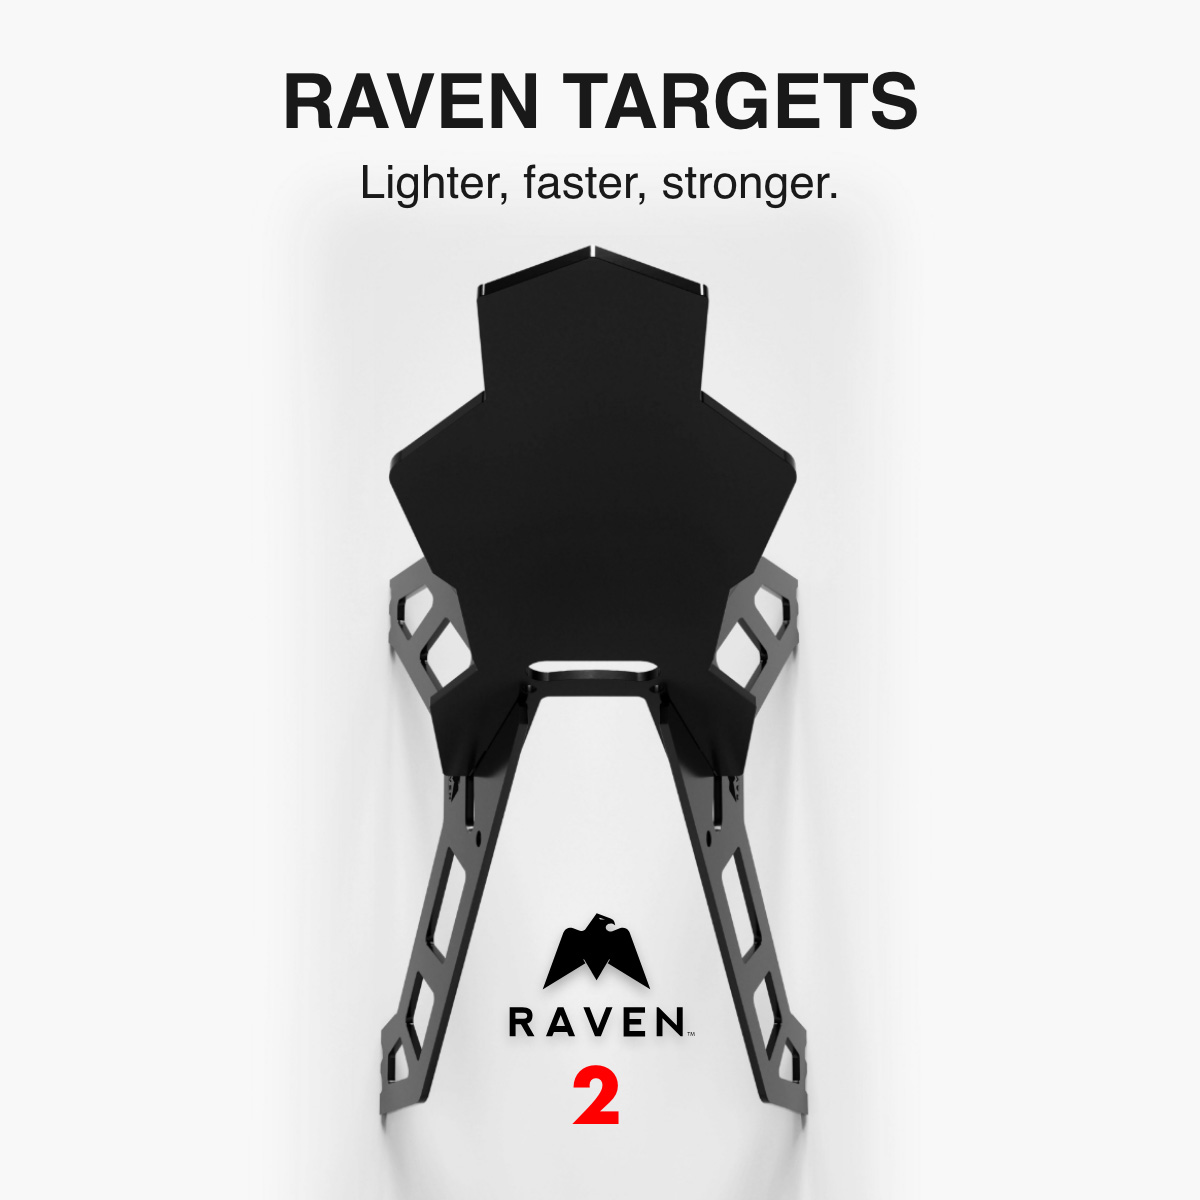 RAVEN AR550 Steel Target